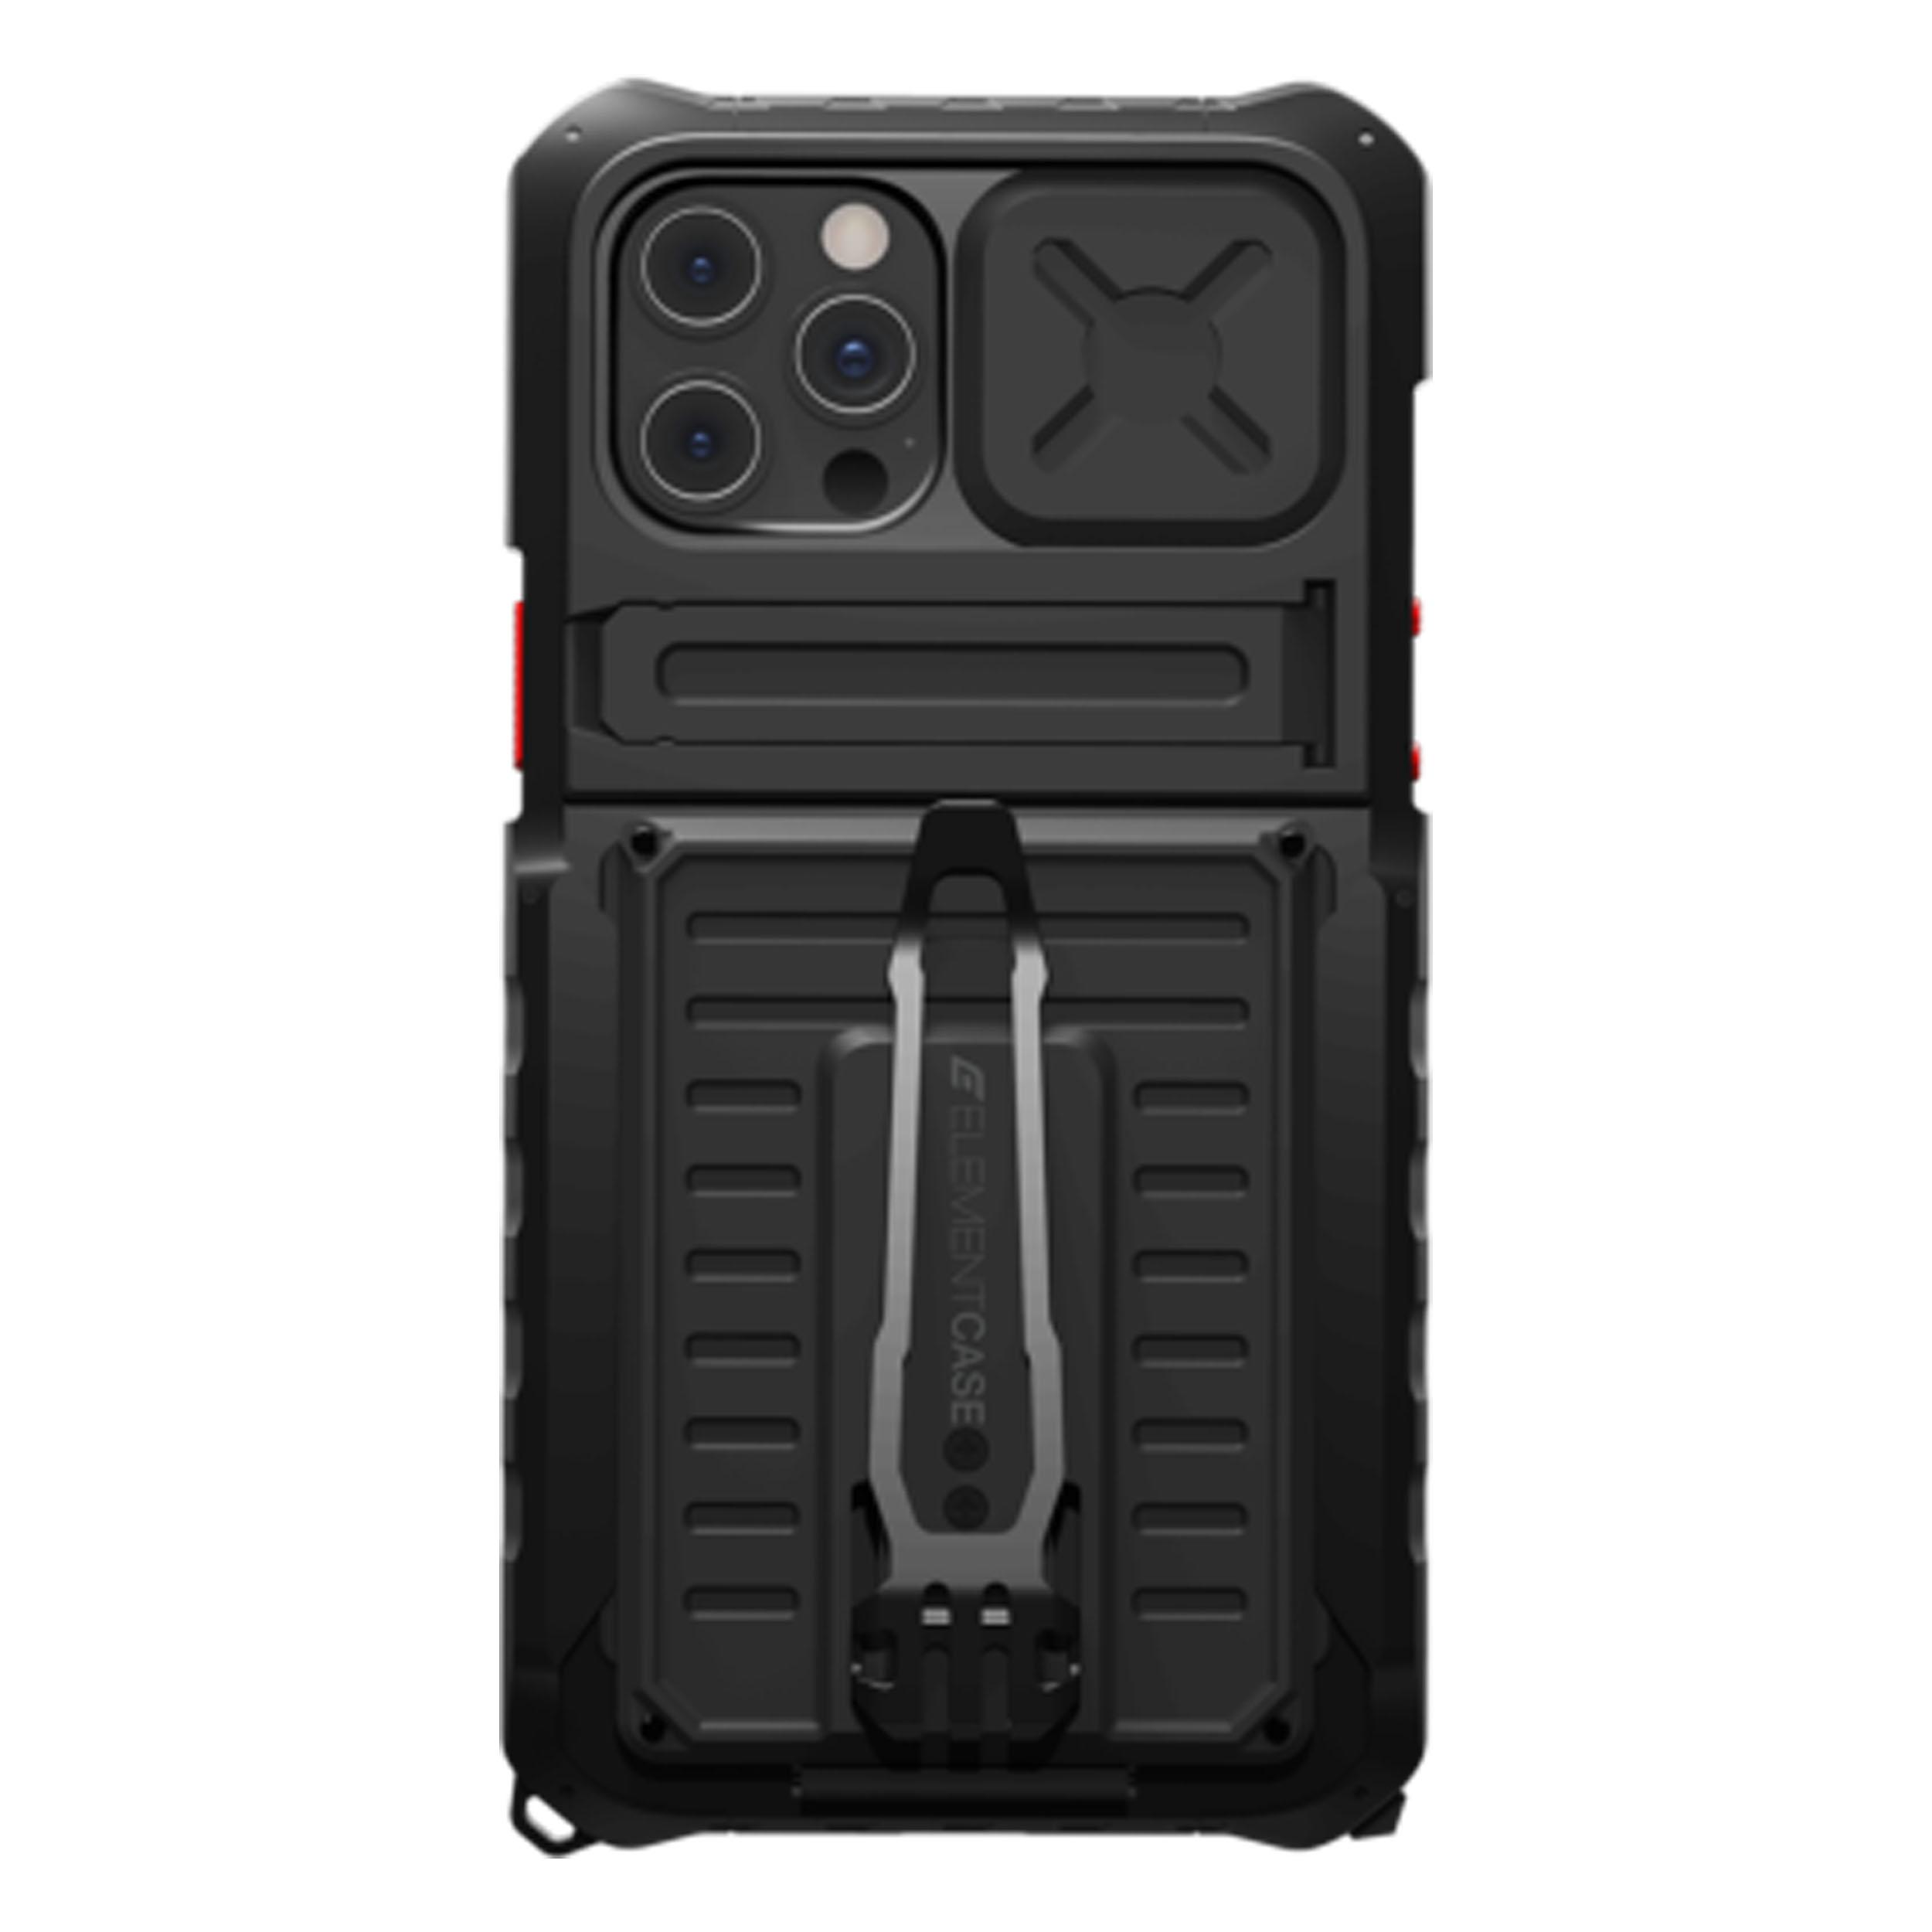 کاور المنت کیس مدل Black OPS X3 مناسب برای گوشی موبایل اپل Iphone 12 /12 pro